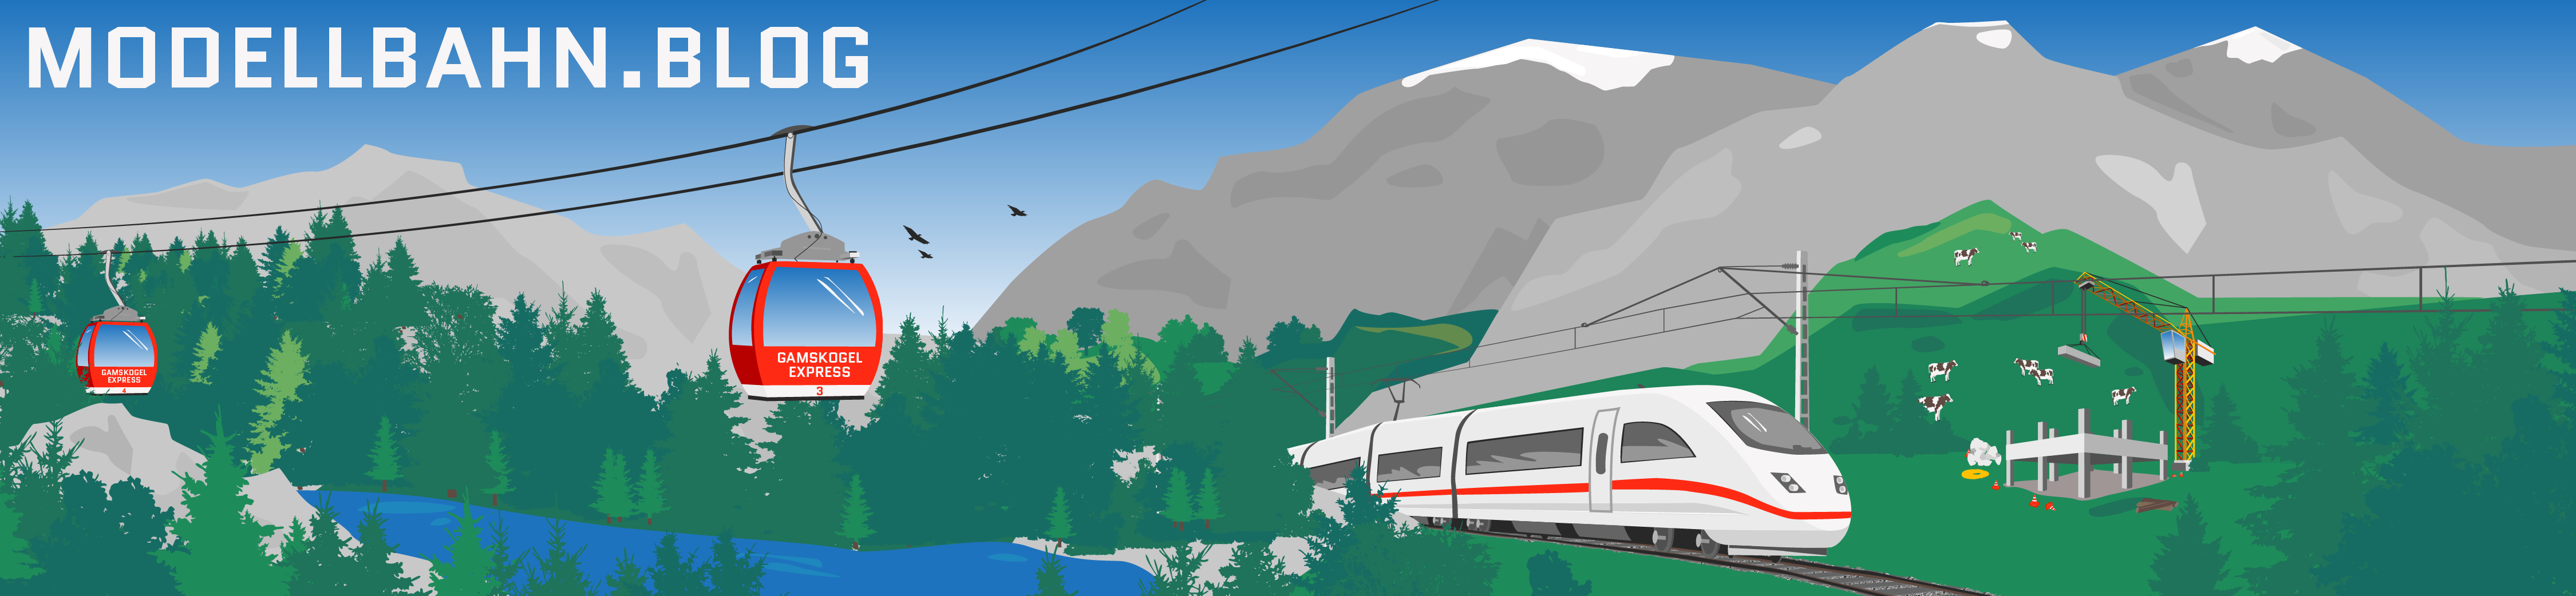 Modellbahn.blog